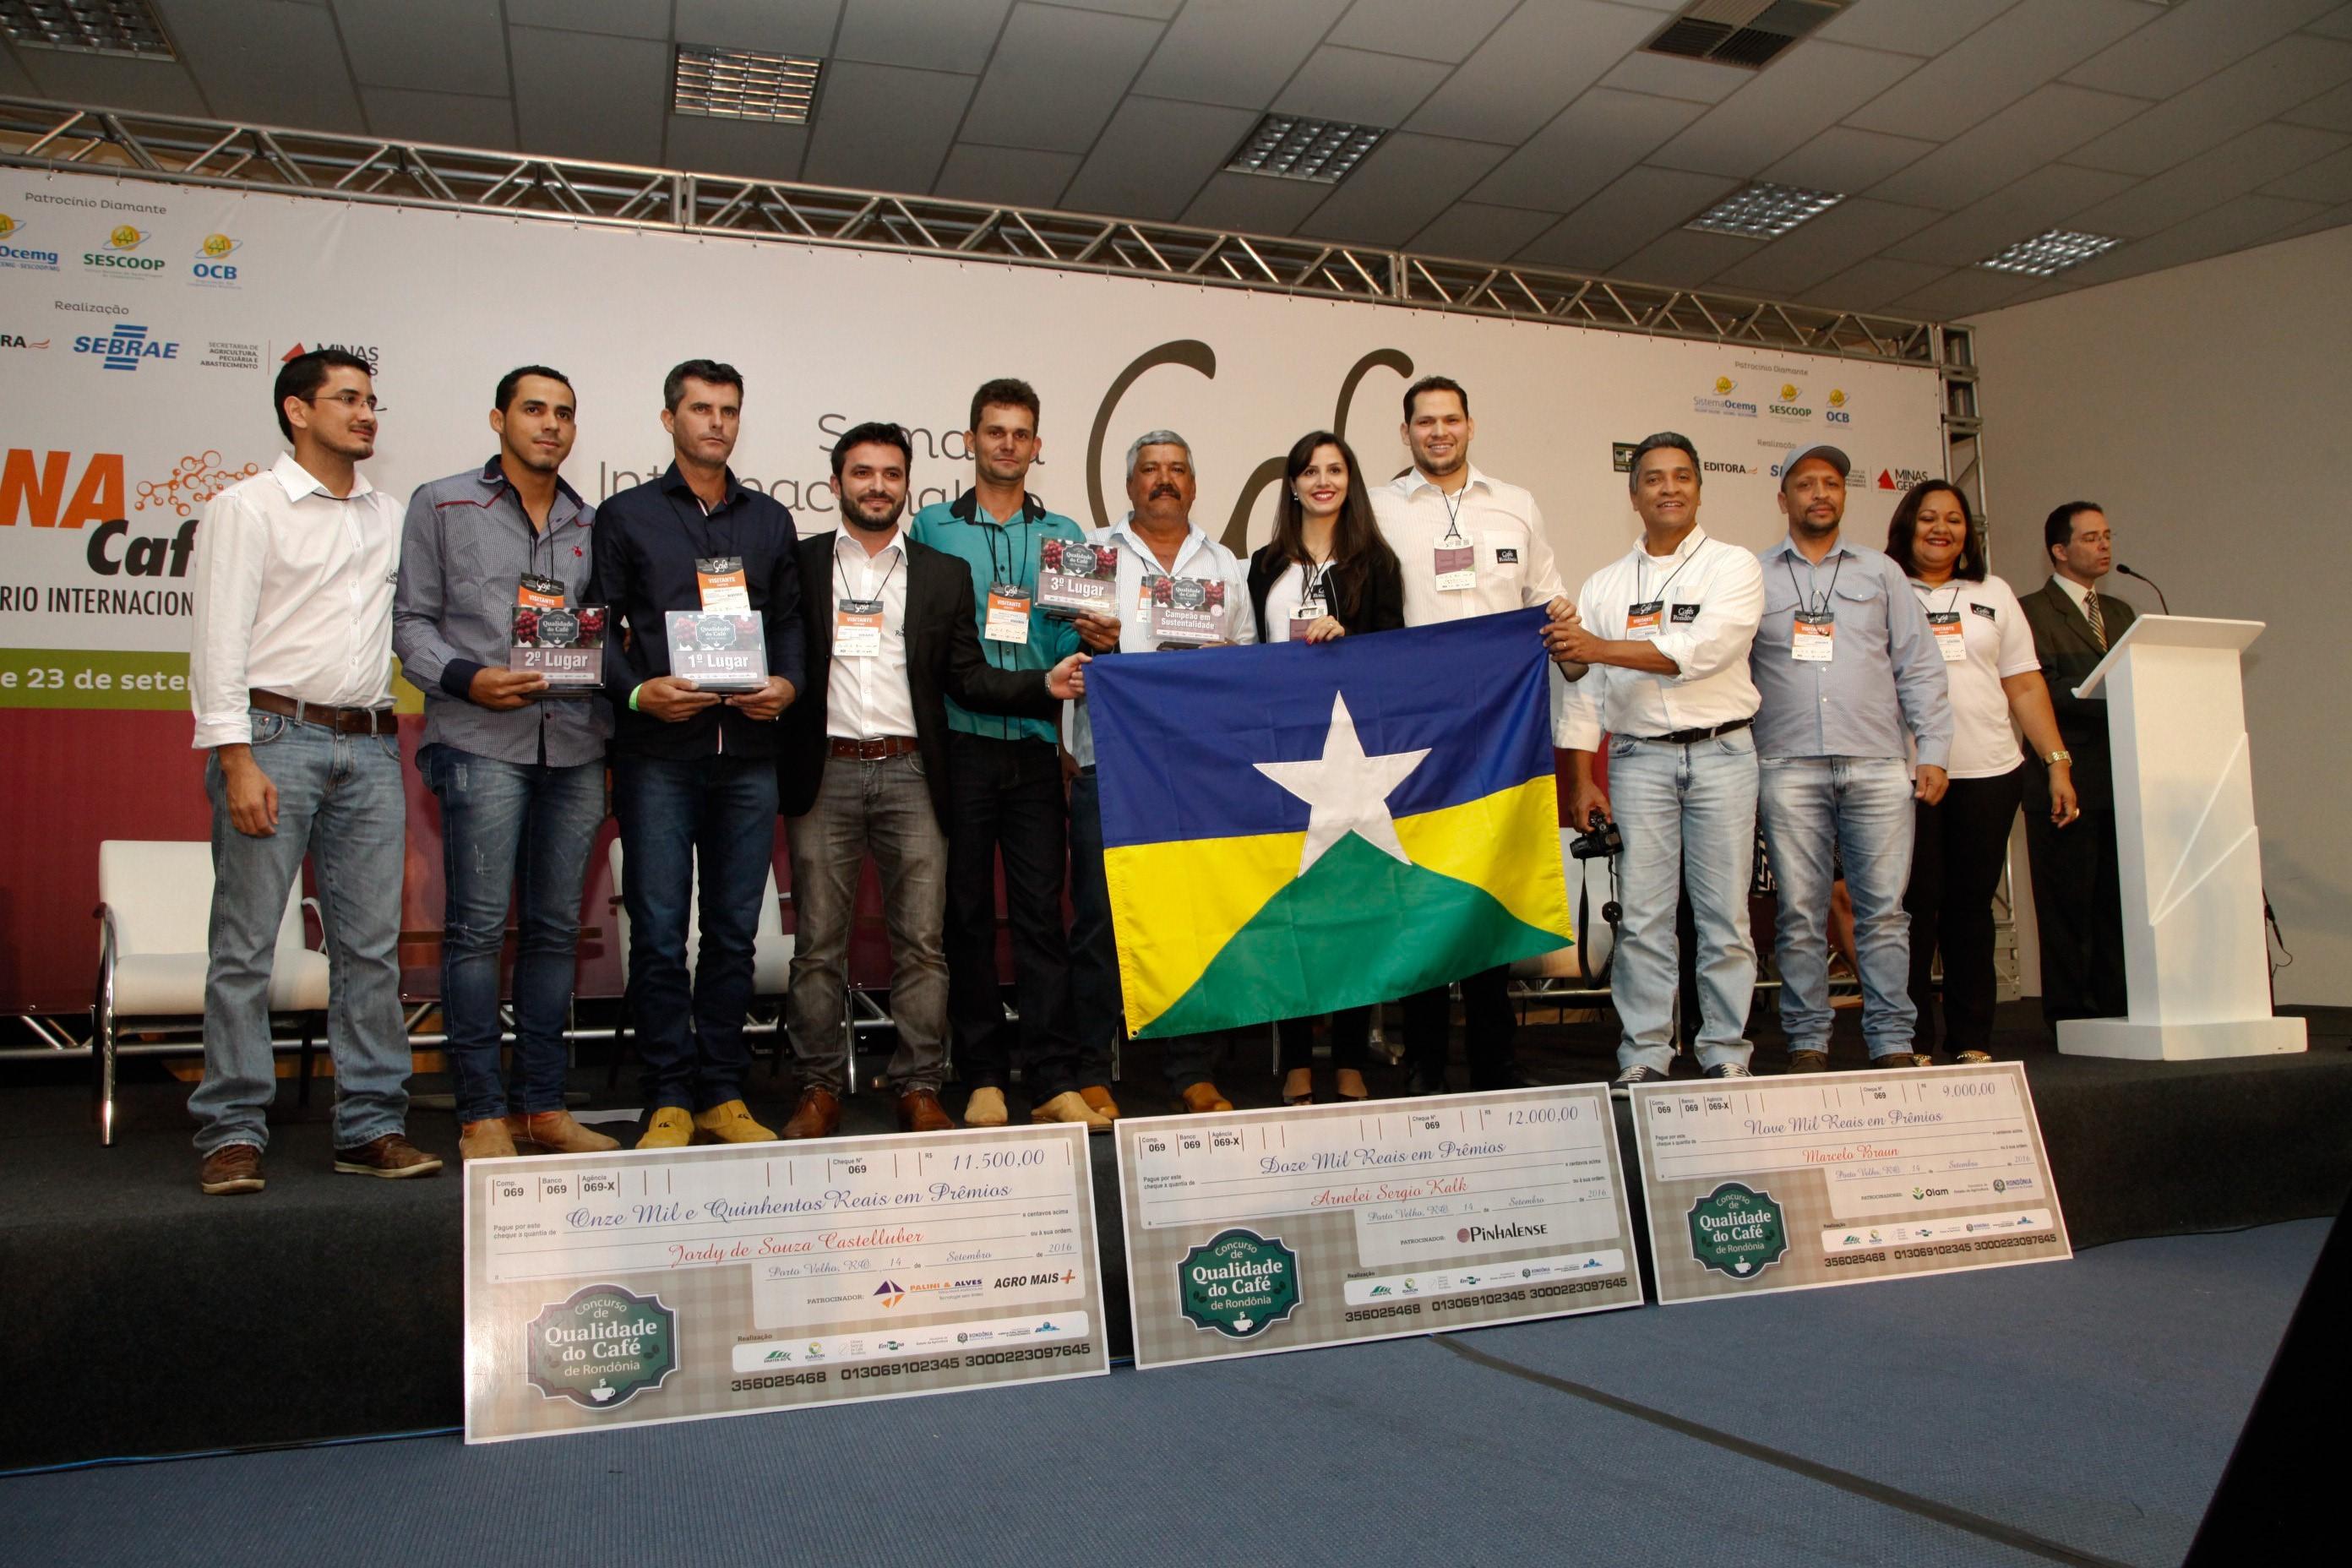 Rondonia´s team and Coffee Quality Contest winners. Photo Credit: Bruno Lavorato